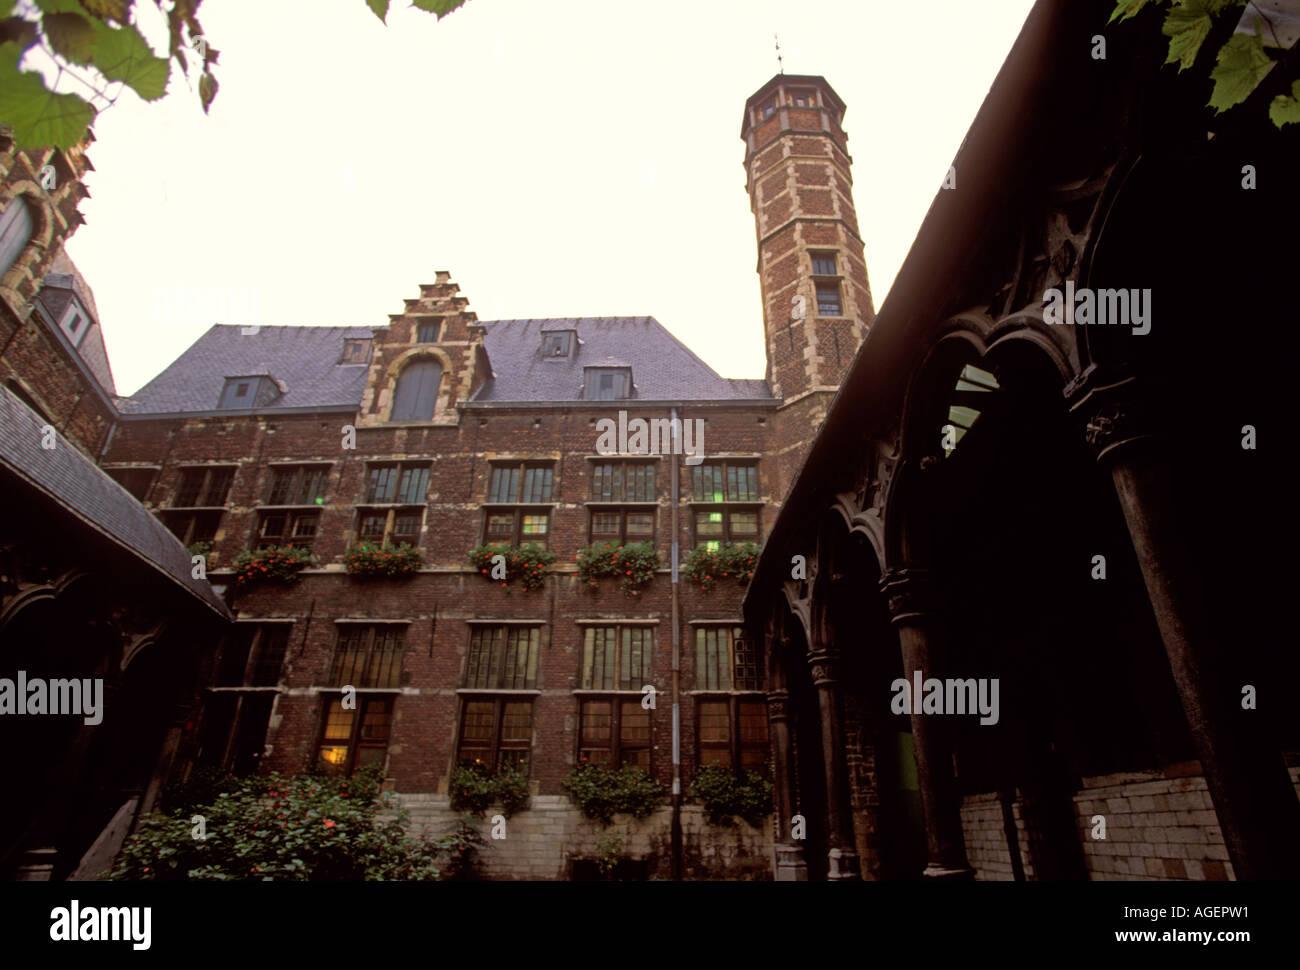 Inner Courtyard, Lookout Tower, Old Exchange, Antwerp, Antwerp Province, Belgium, Europe - Stock Image